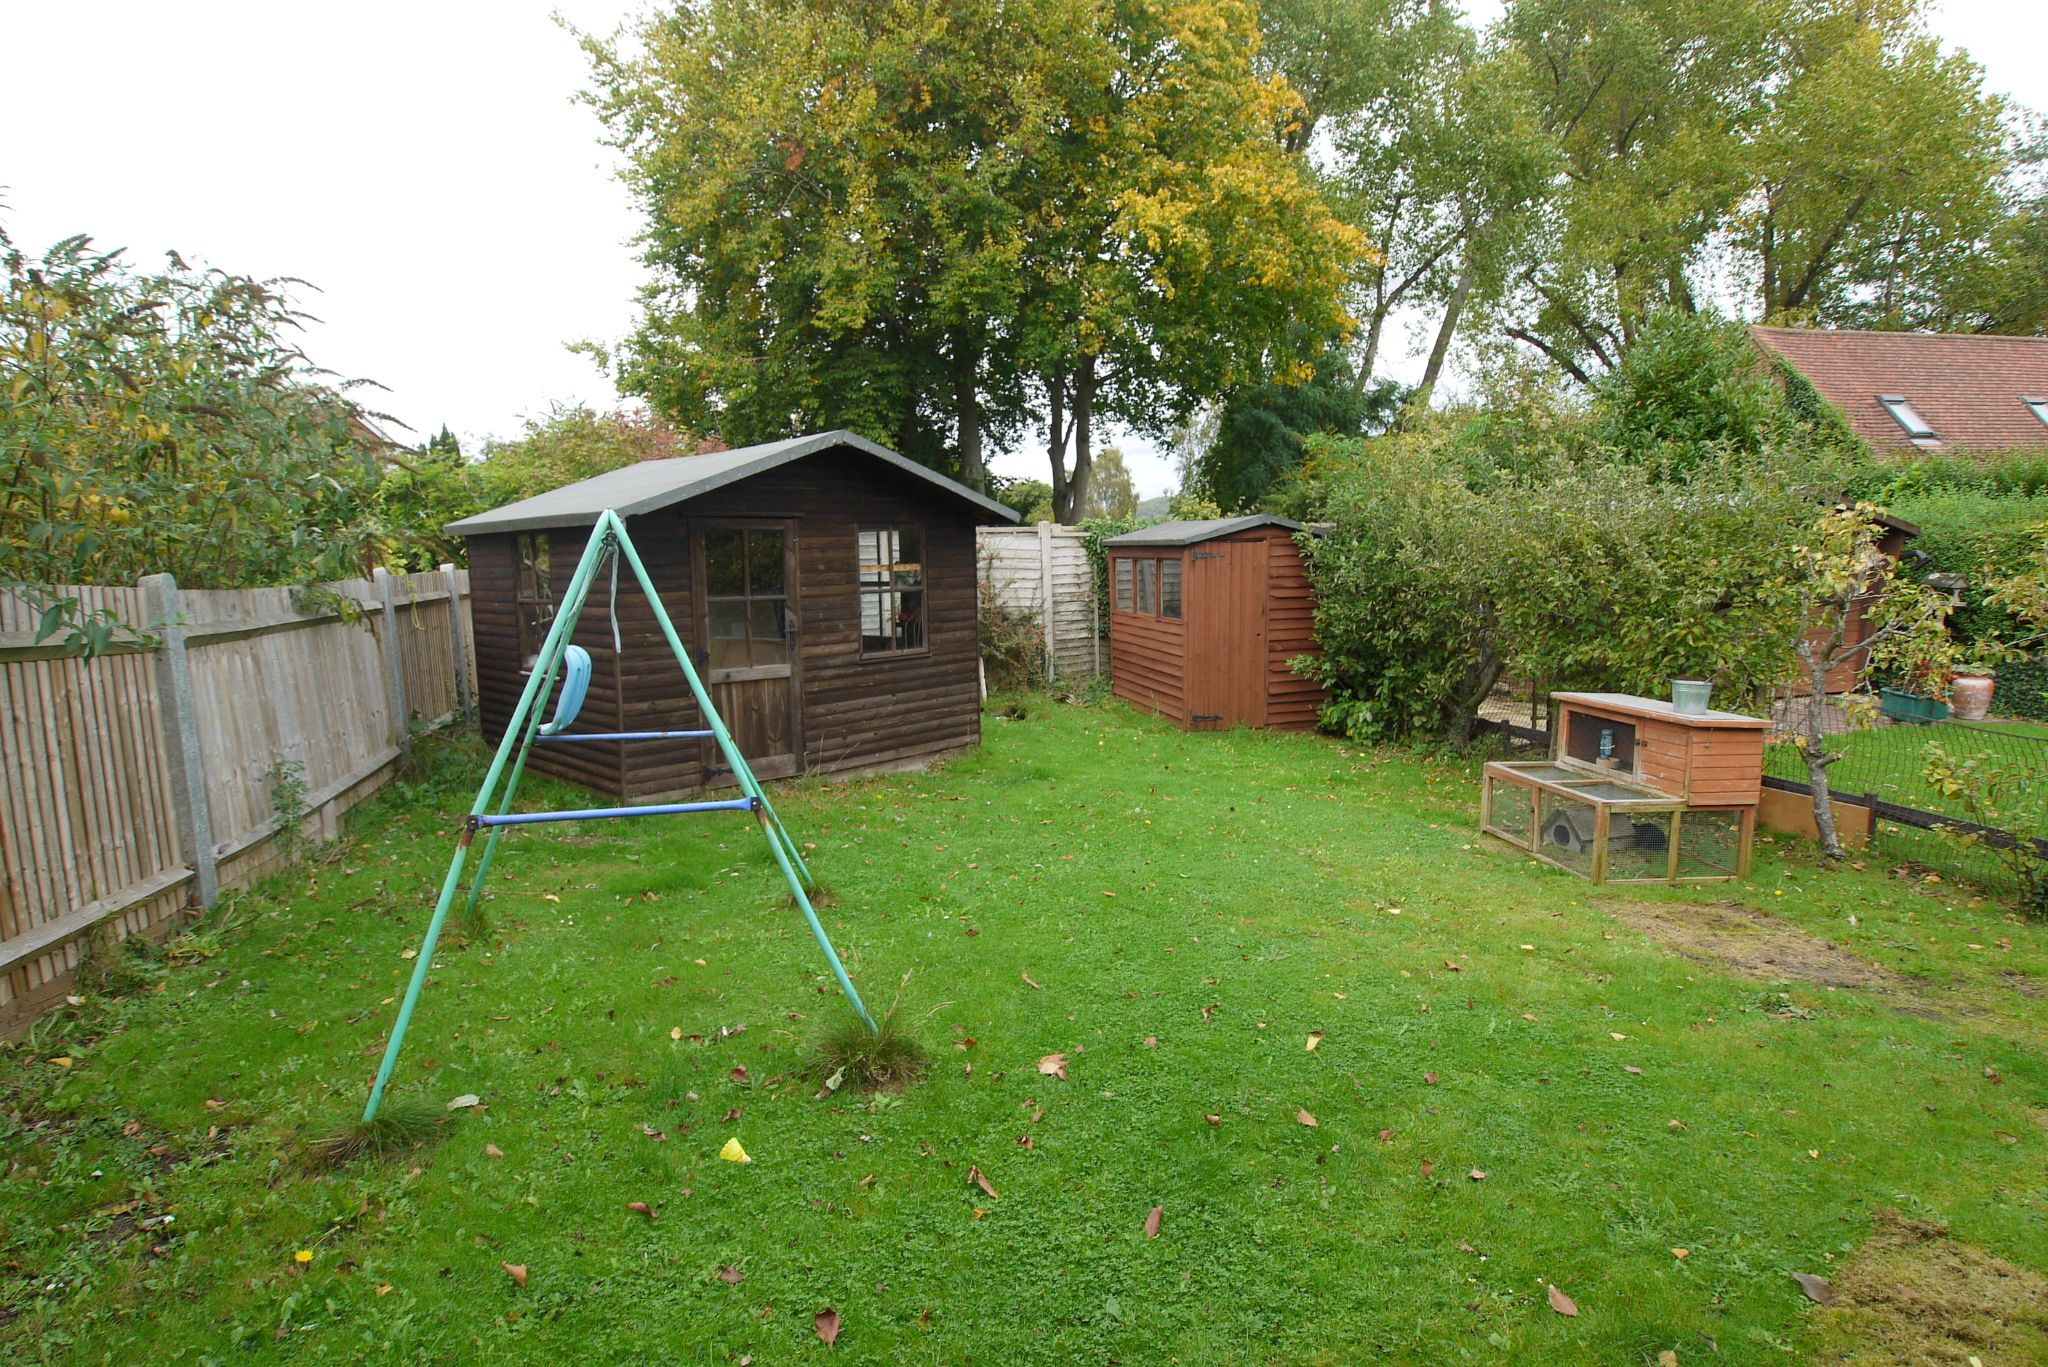 3 bedroom semi-detached house Sold in Sevenoaks - Photograph 8